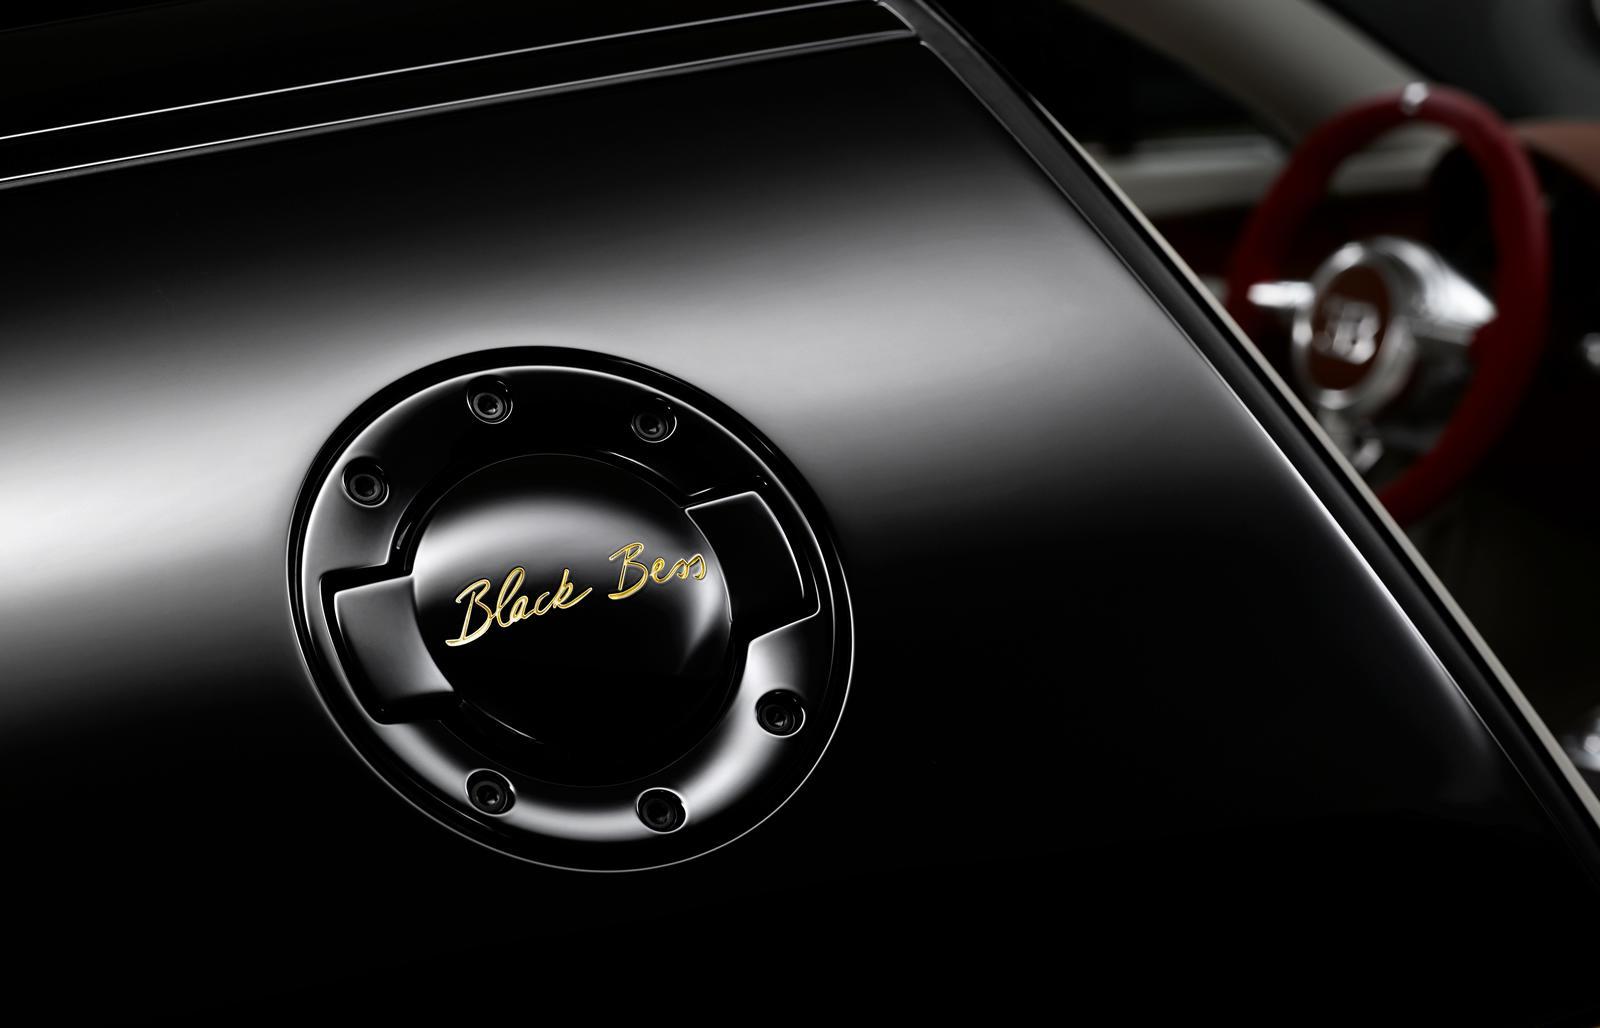 2014 bugatti veyron grand sport vitesse black bess. Black Bedroom Furniture Sets. Home Design Ideas